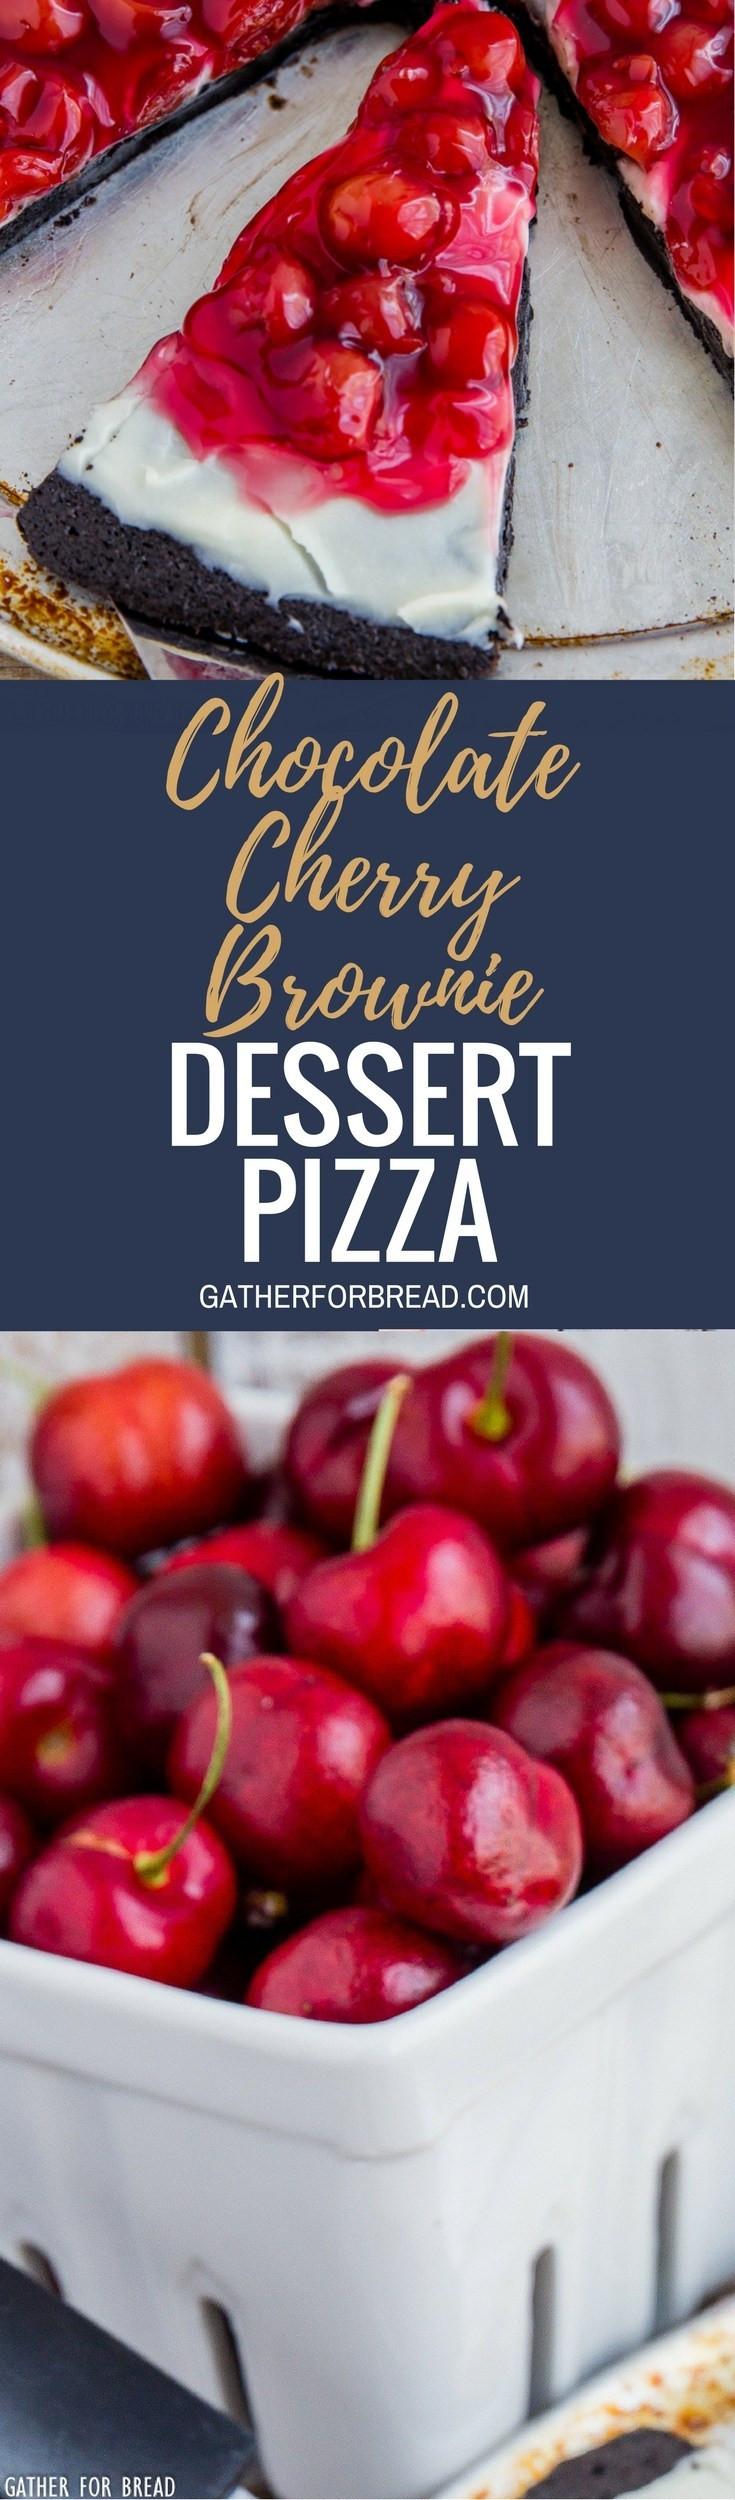 Chocolate Cherry Dessert  Chocolate Cherry Brownie Dessert Pizza Gather for Bread